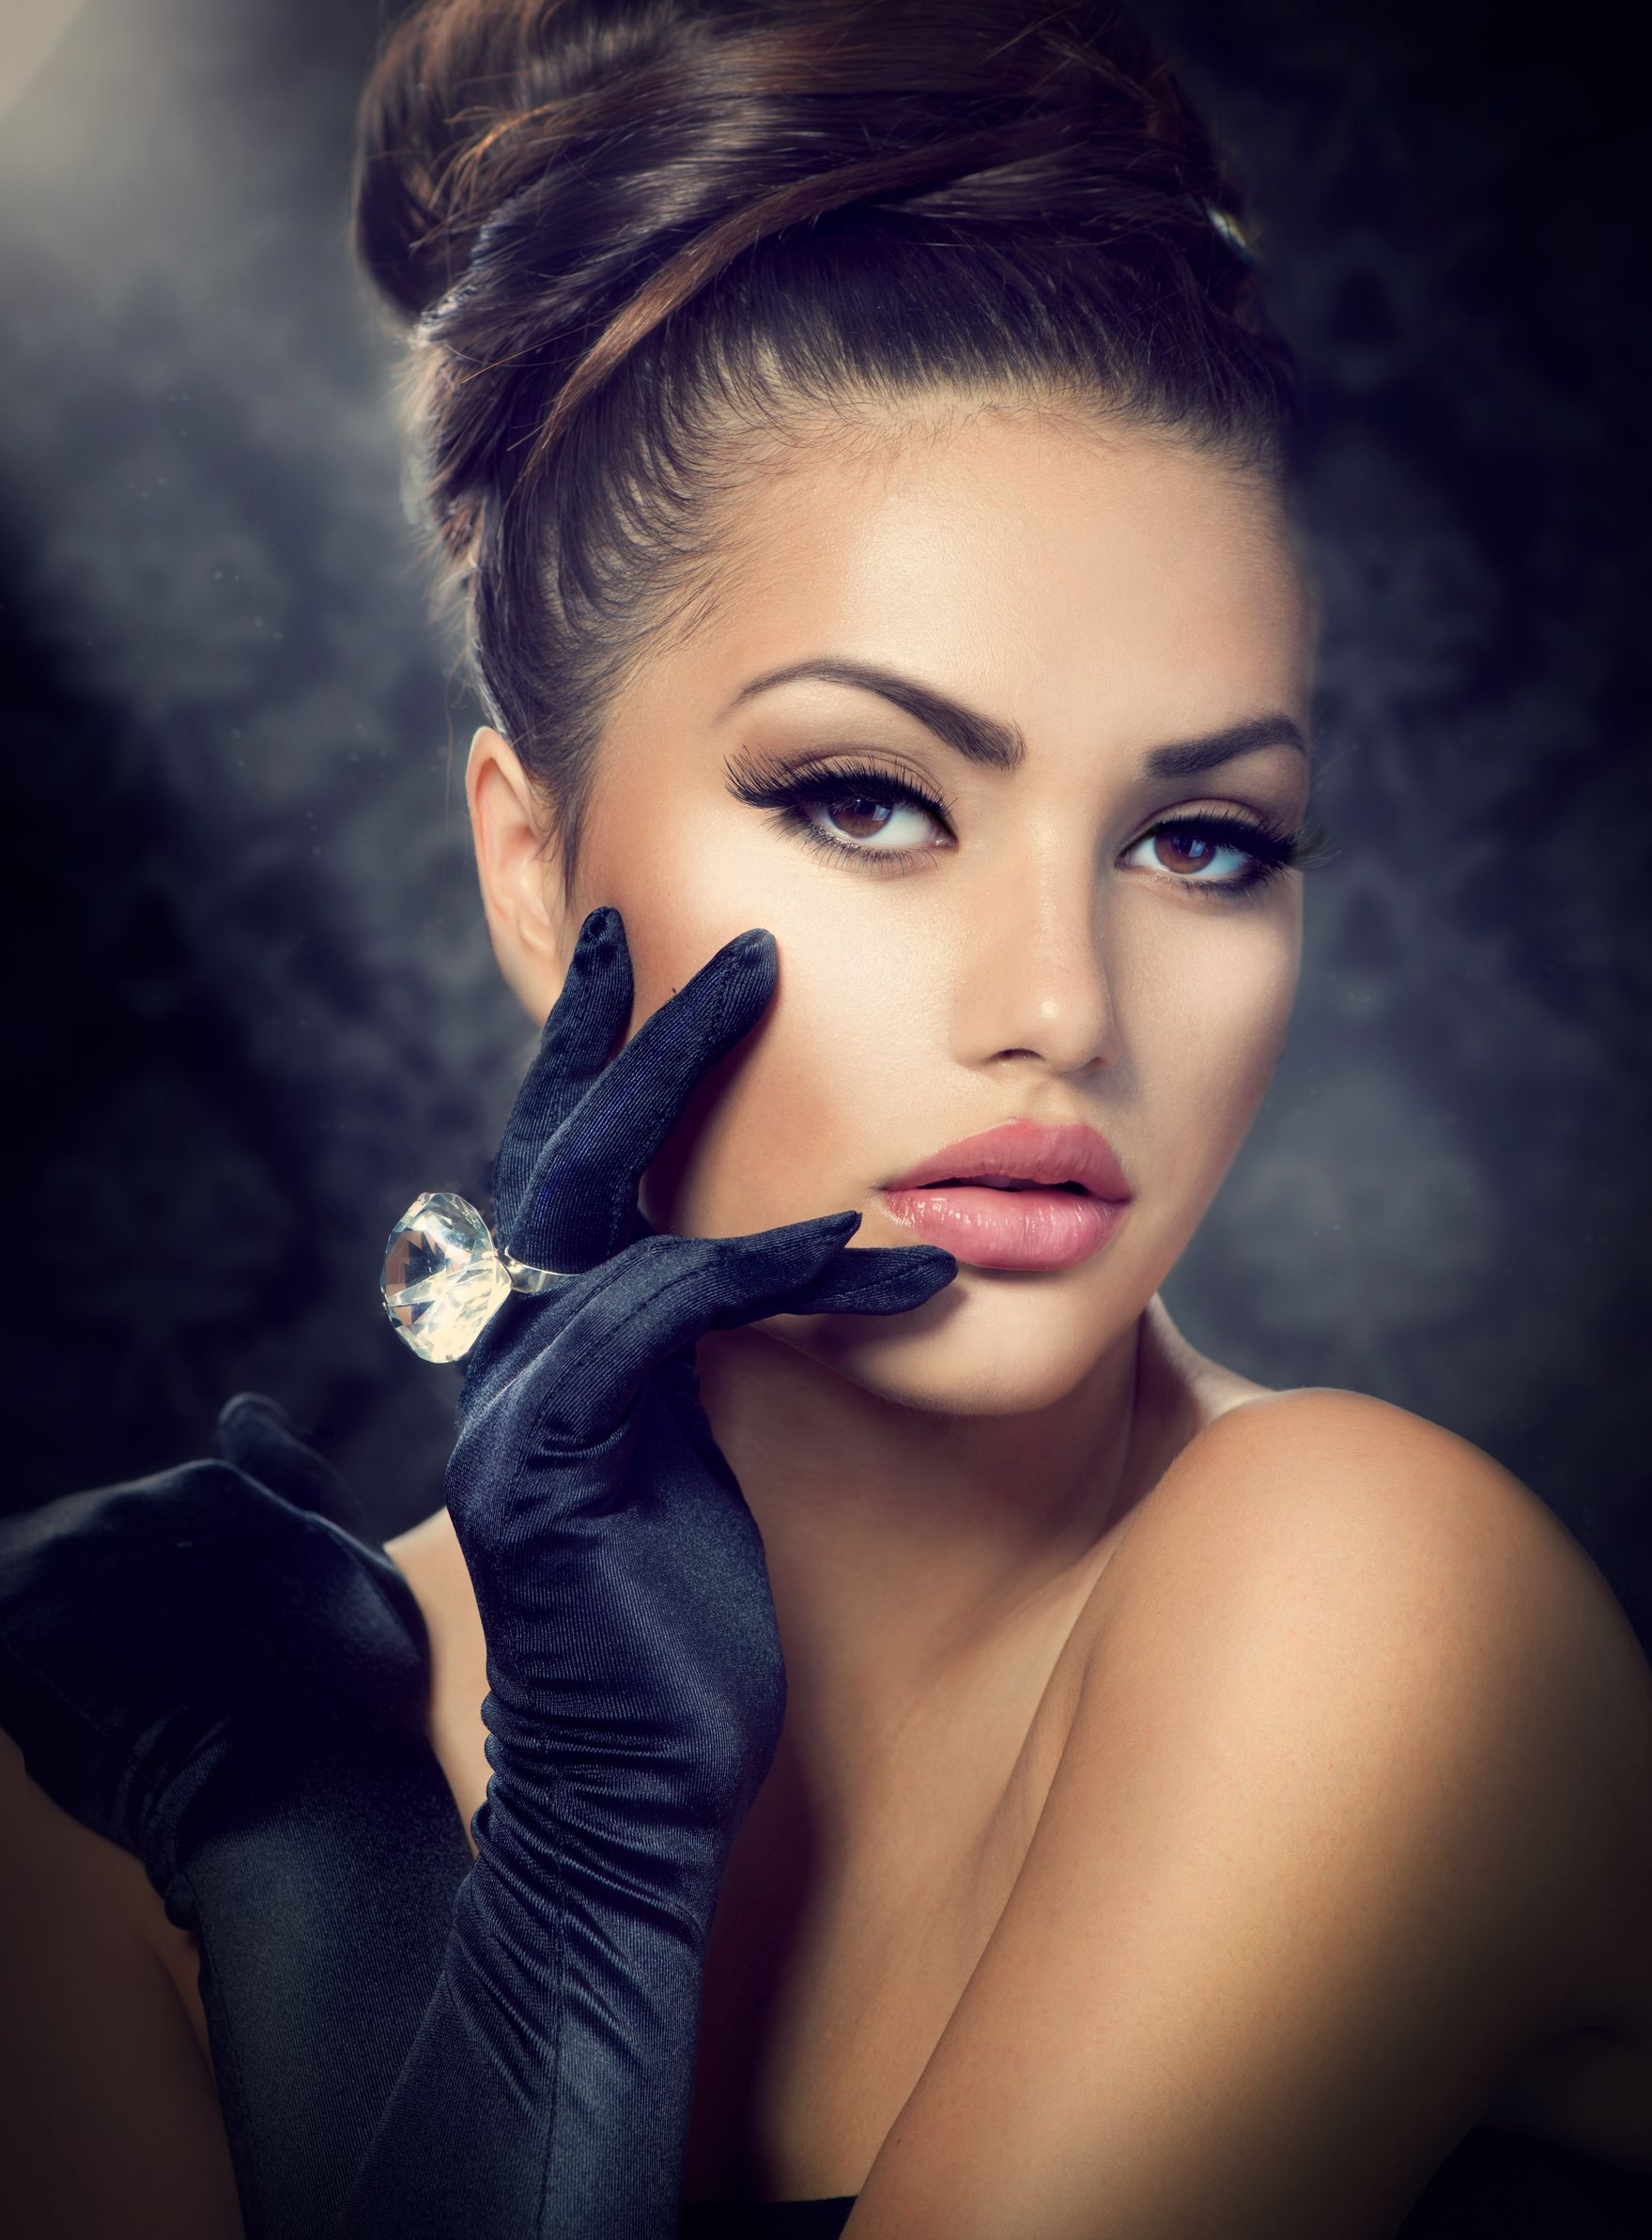 20956695 - beauty fashion girl portrait  vintage style girl wearing gloves